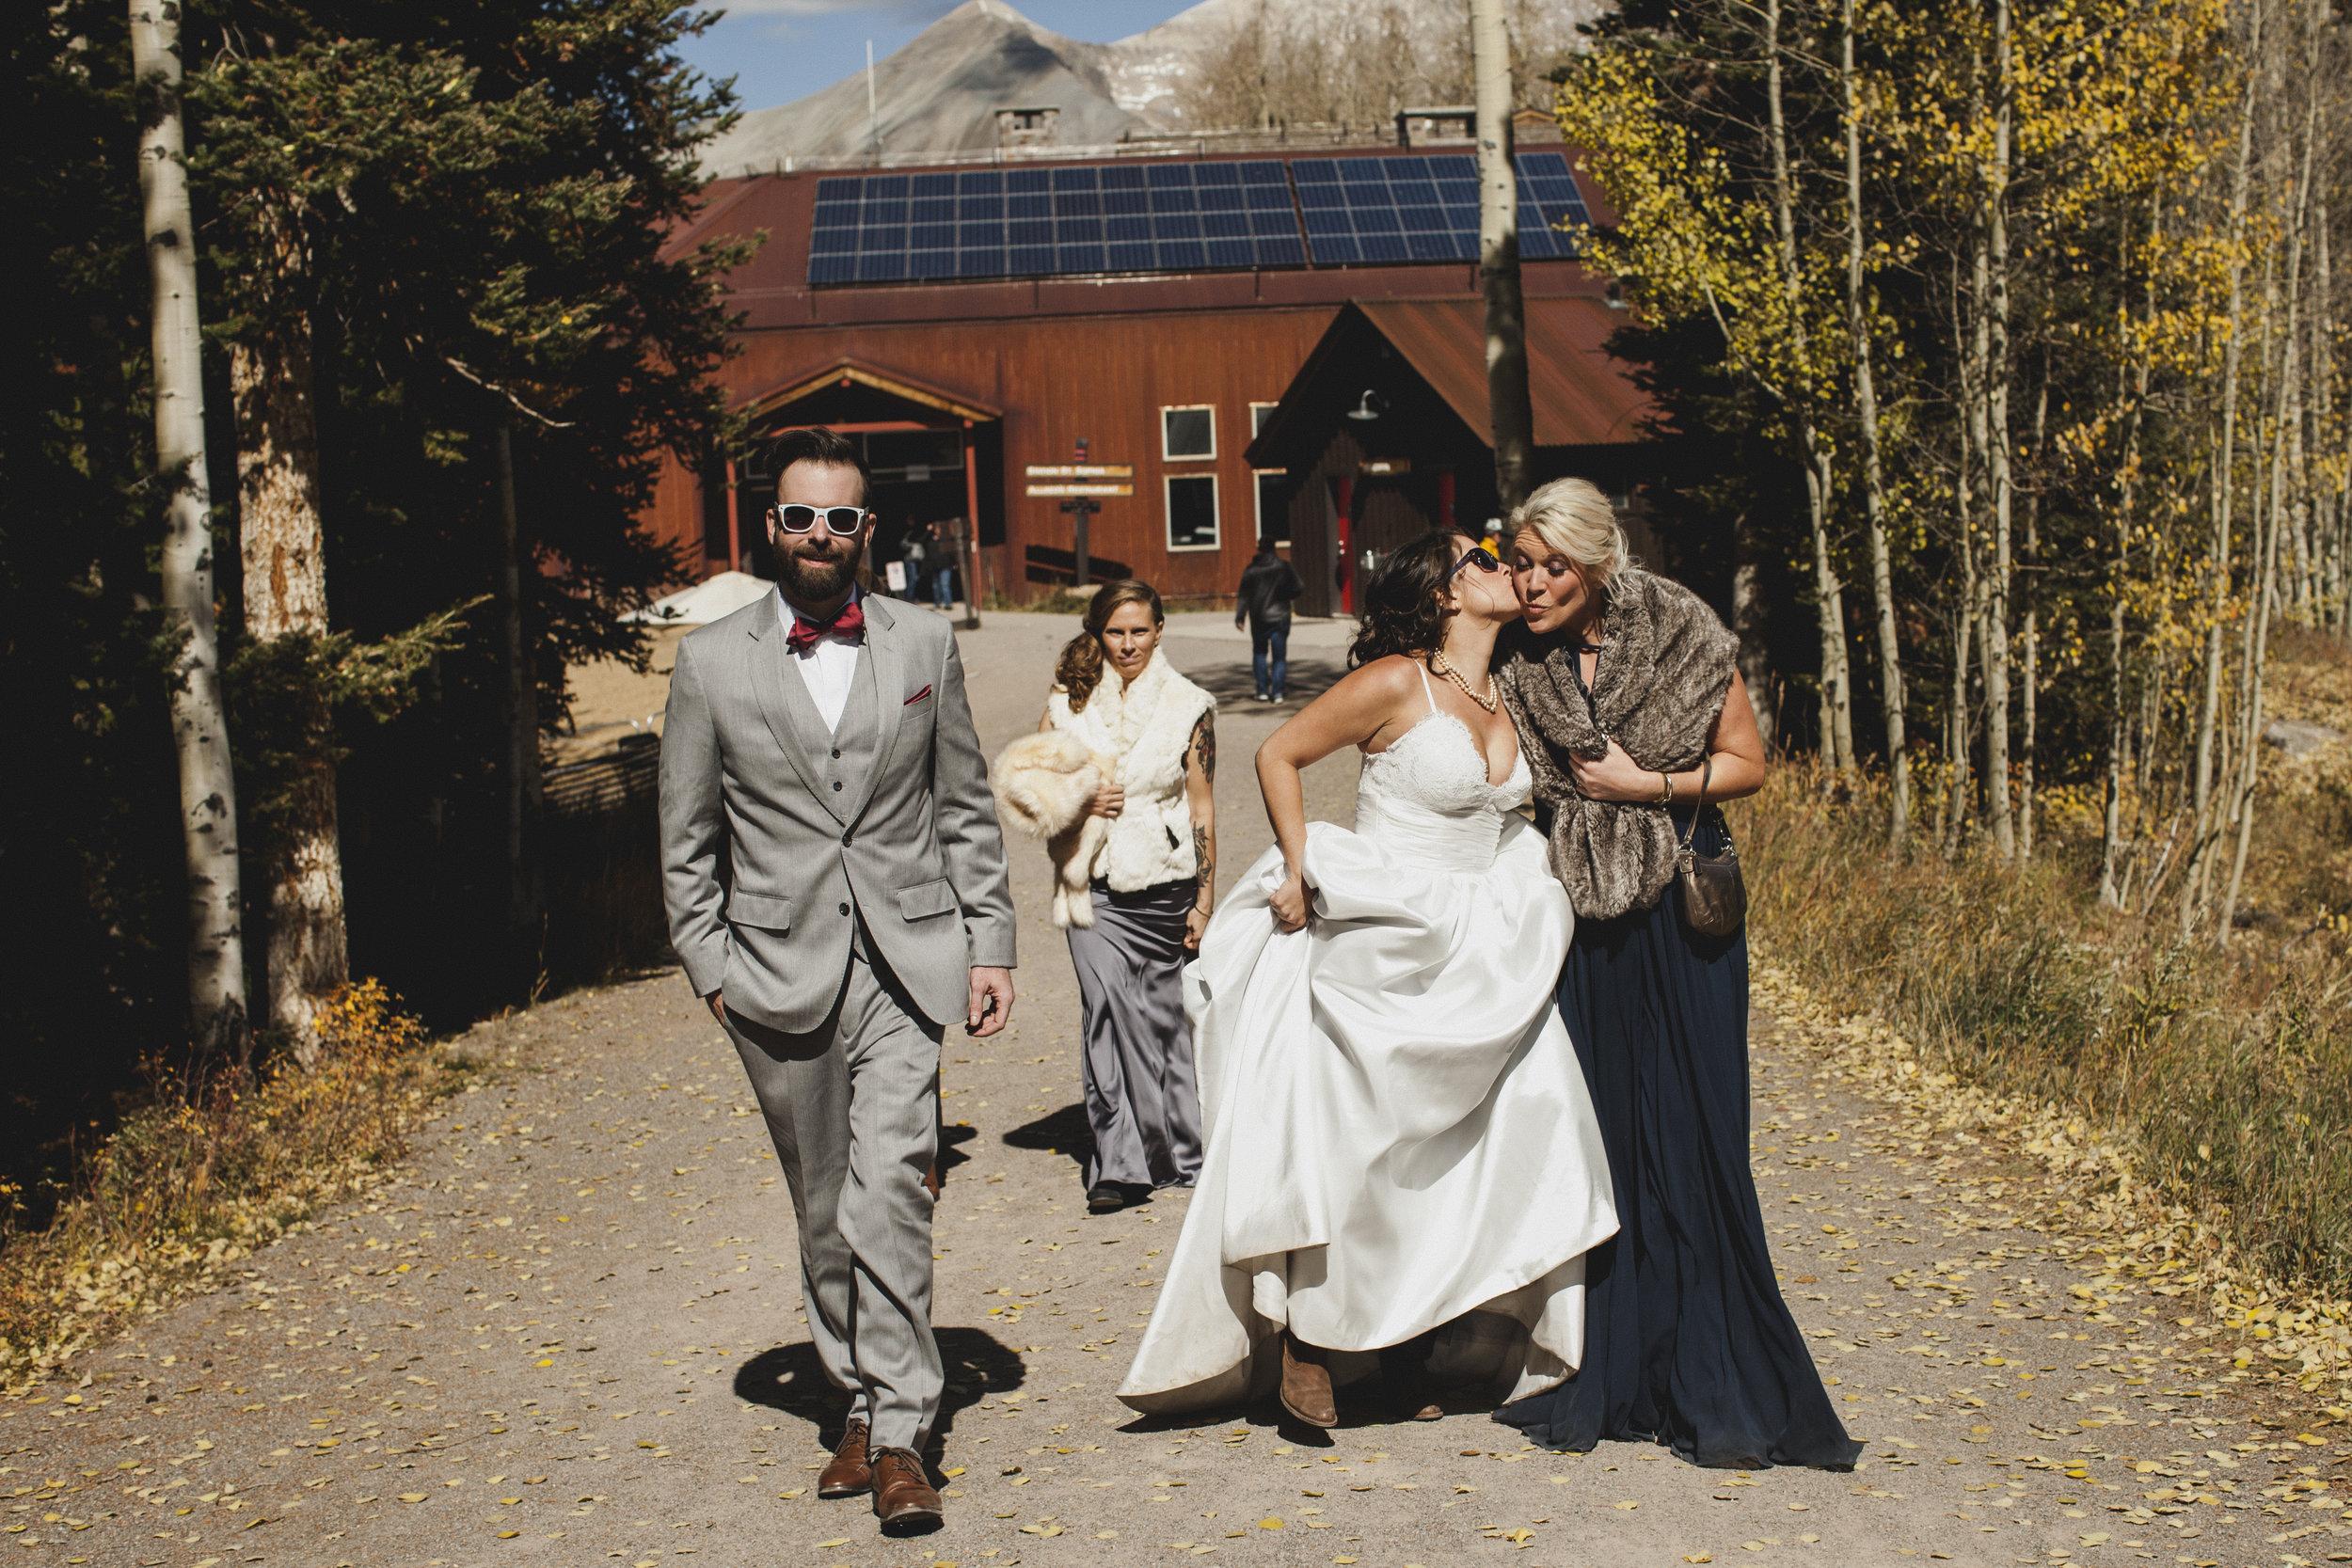 NE-LeahandAshtonphotography-Telluride-Wedding-Photography-6692.jpg